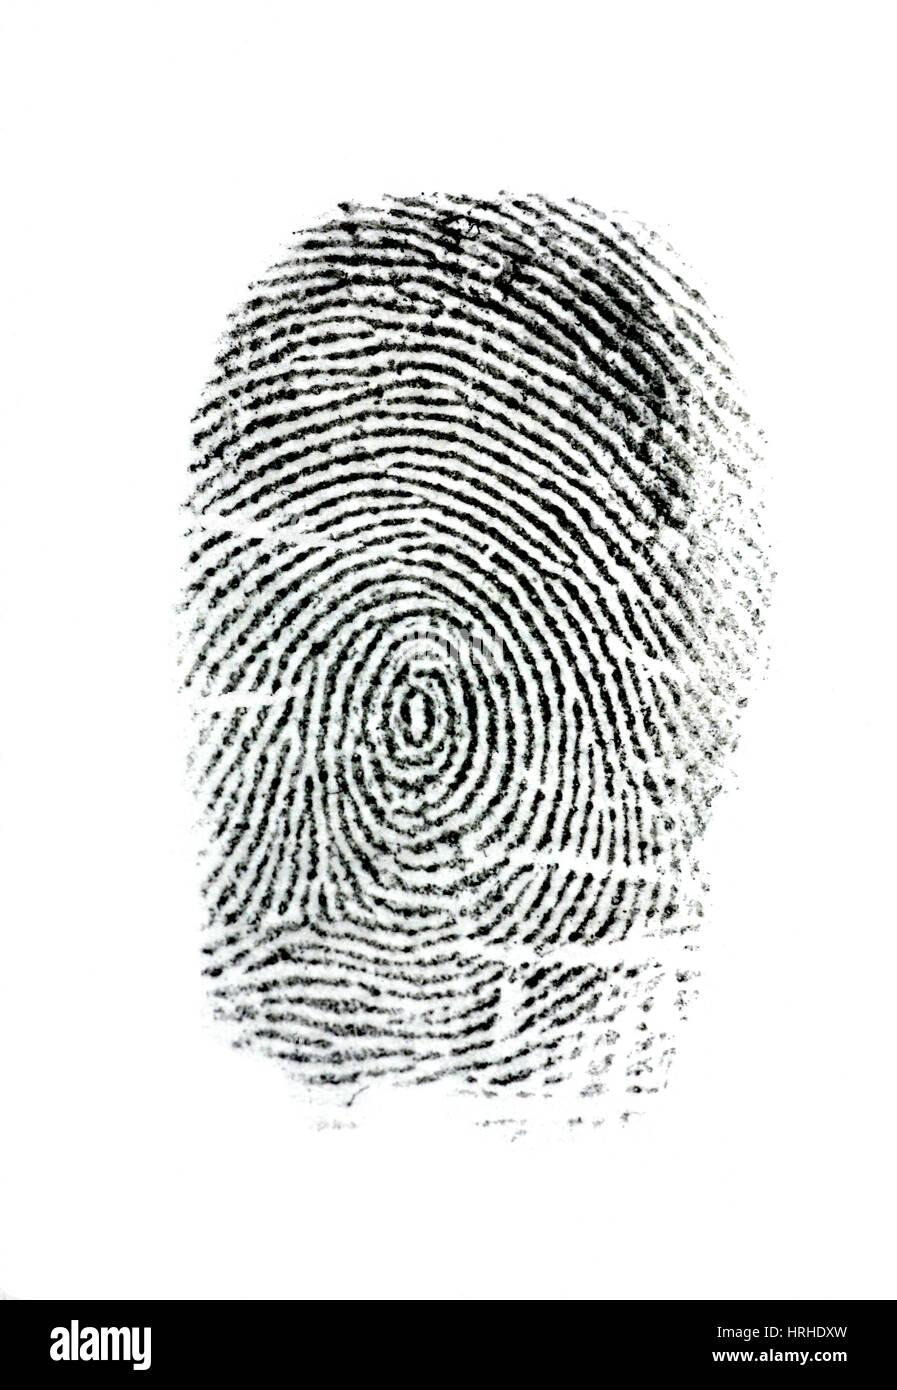 galton fingerprints